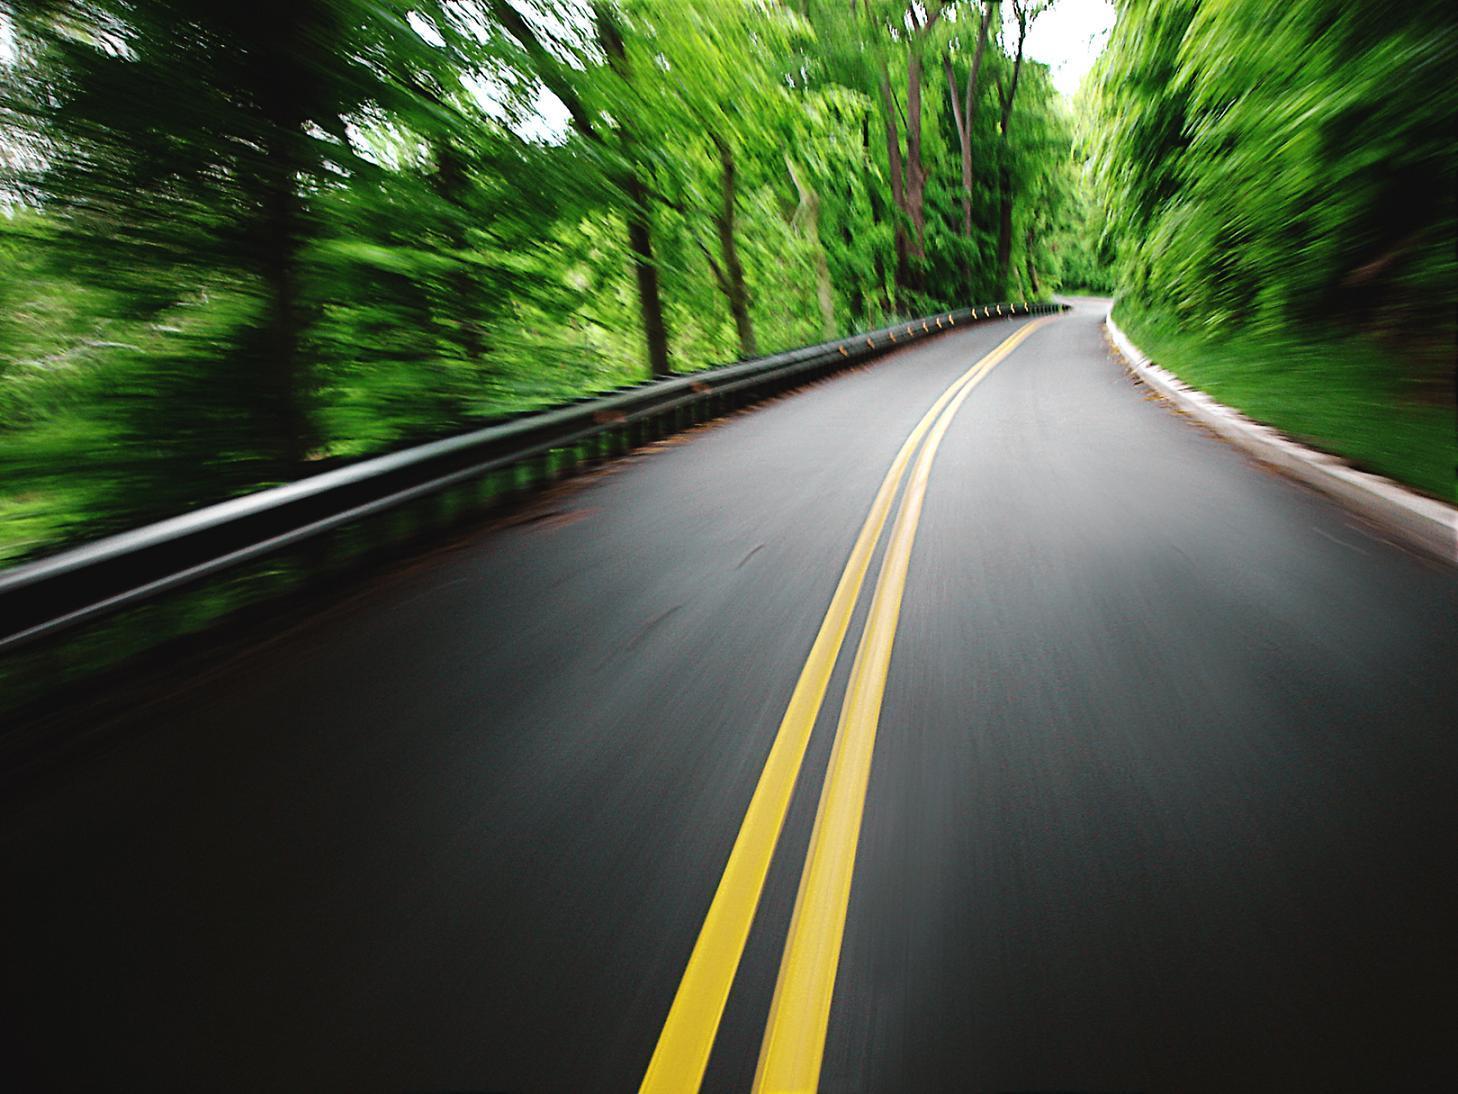 http://3.bp.blogspot.com/_Dpf9O81JrFw/S80OnvR9W8I/AAAAAAAACKk/MnA8JSSJDYw/s1600/estrada.jpg